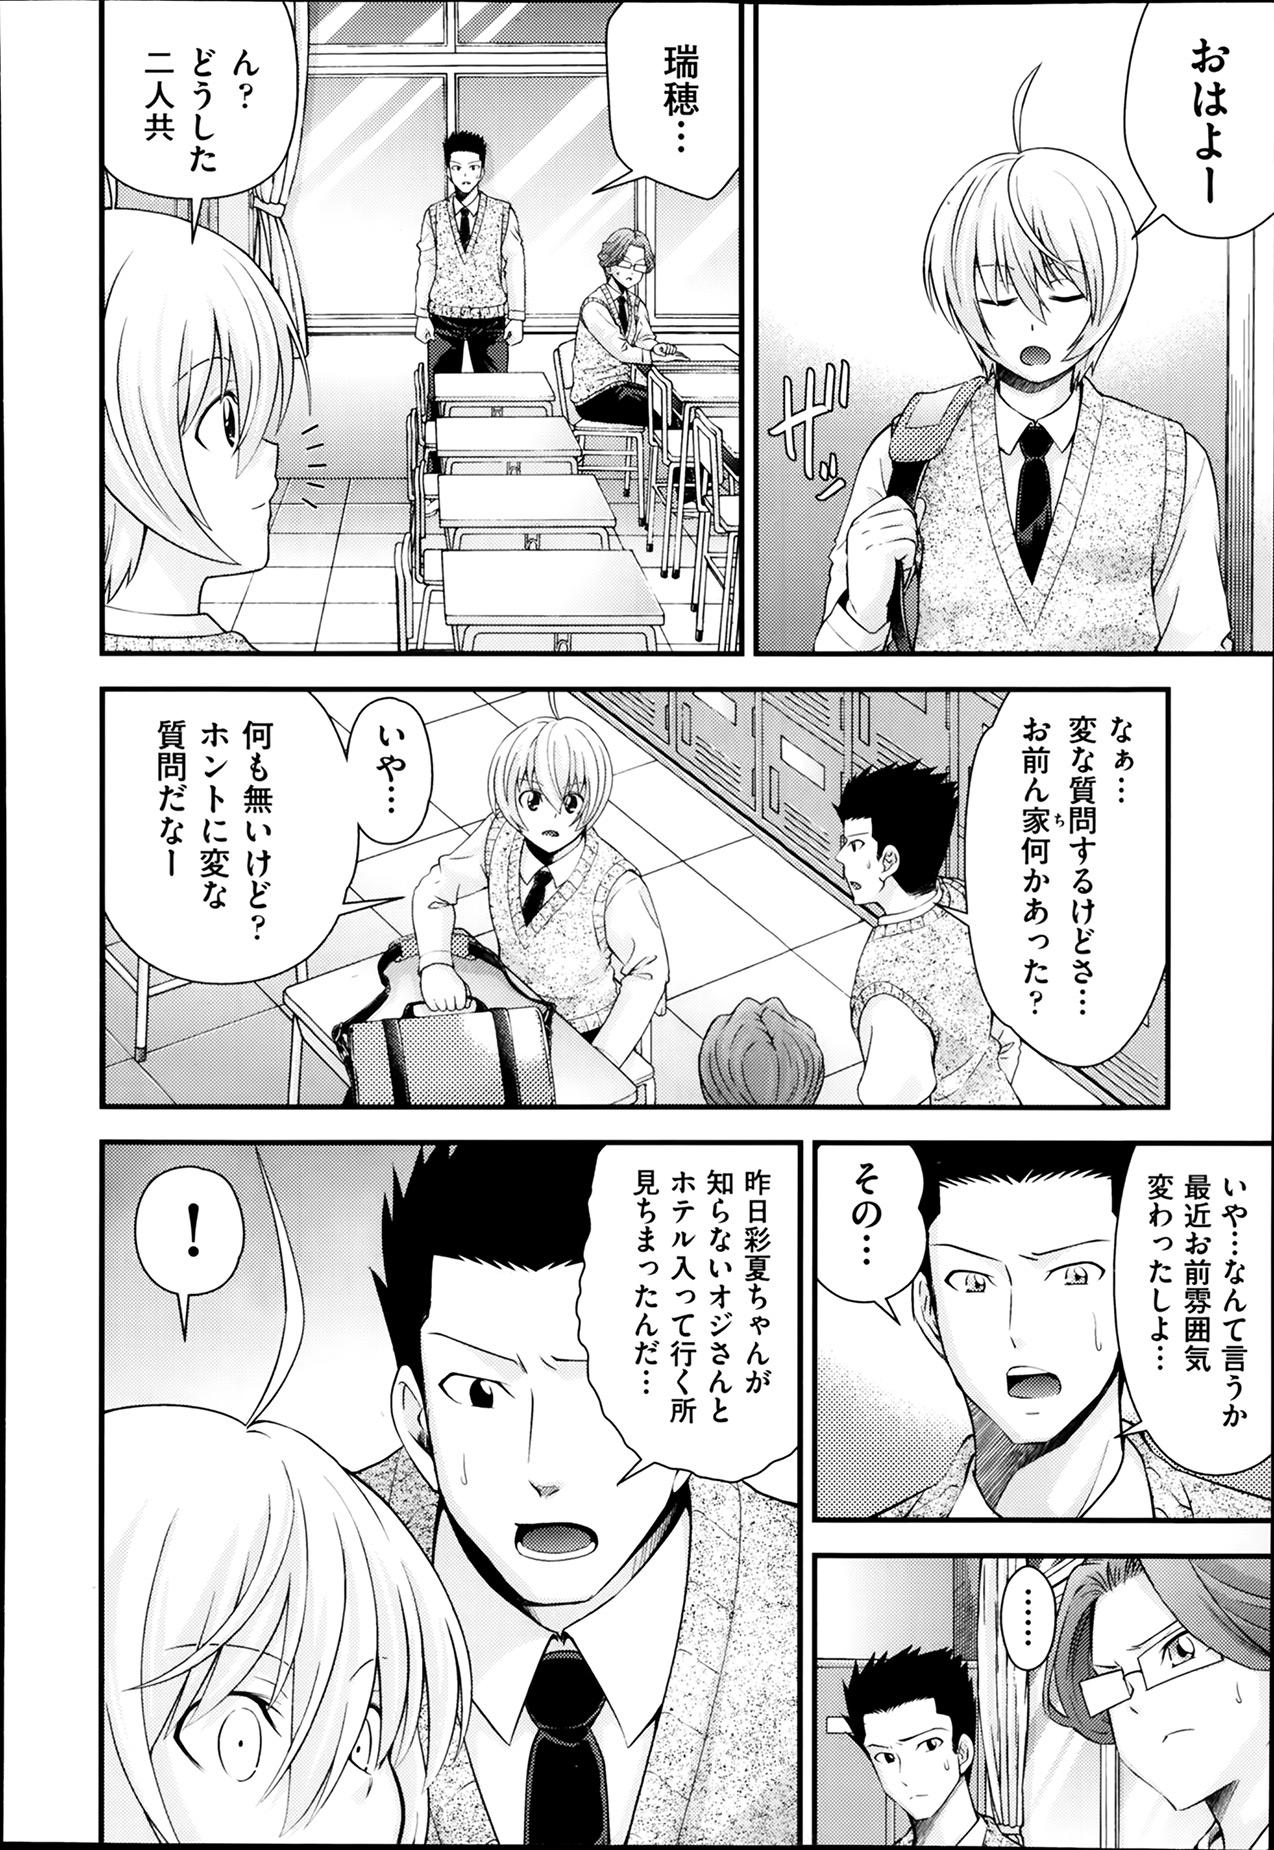 Kyoudai Replace 73